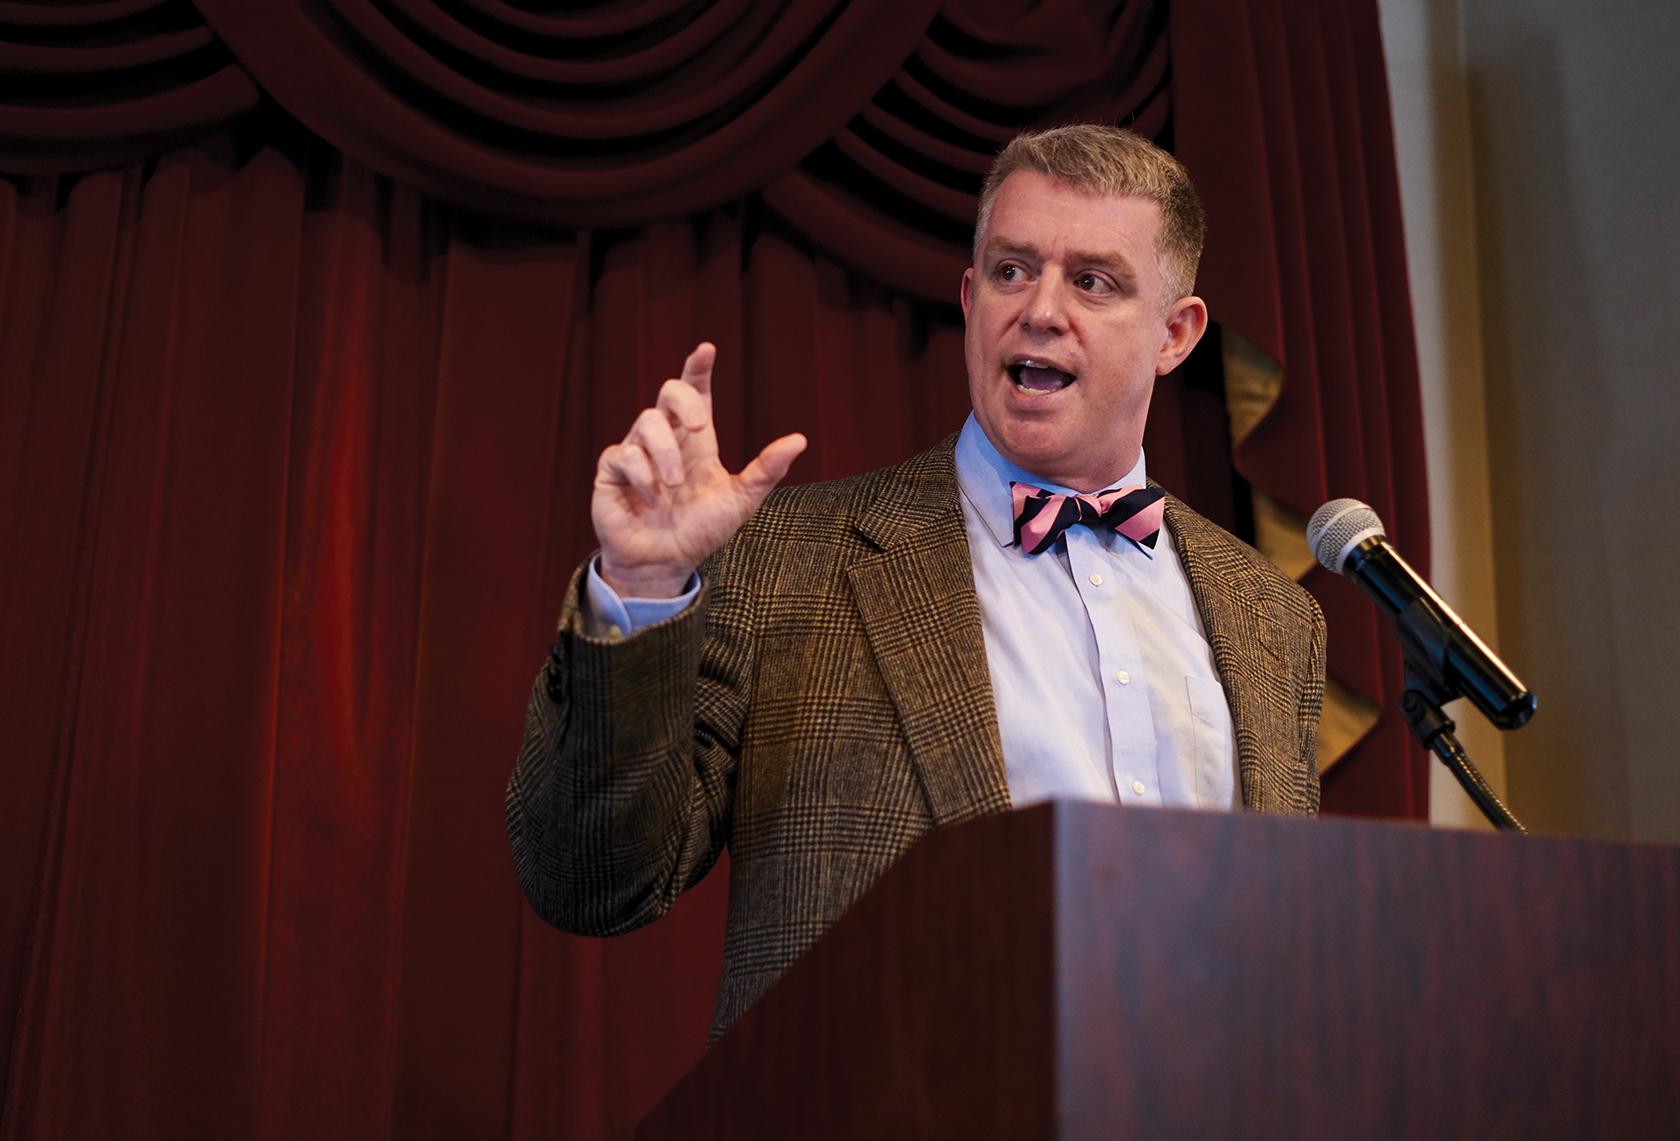 Associate professor of History Robert Ingram fosters dialogue and debate in American politics. Photo by Evan Leonard BSVC '18.